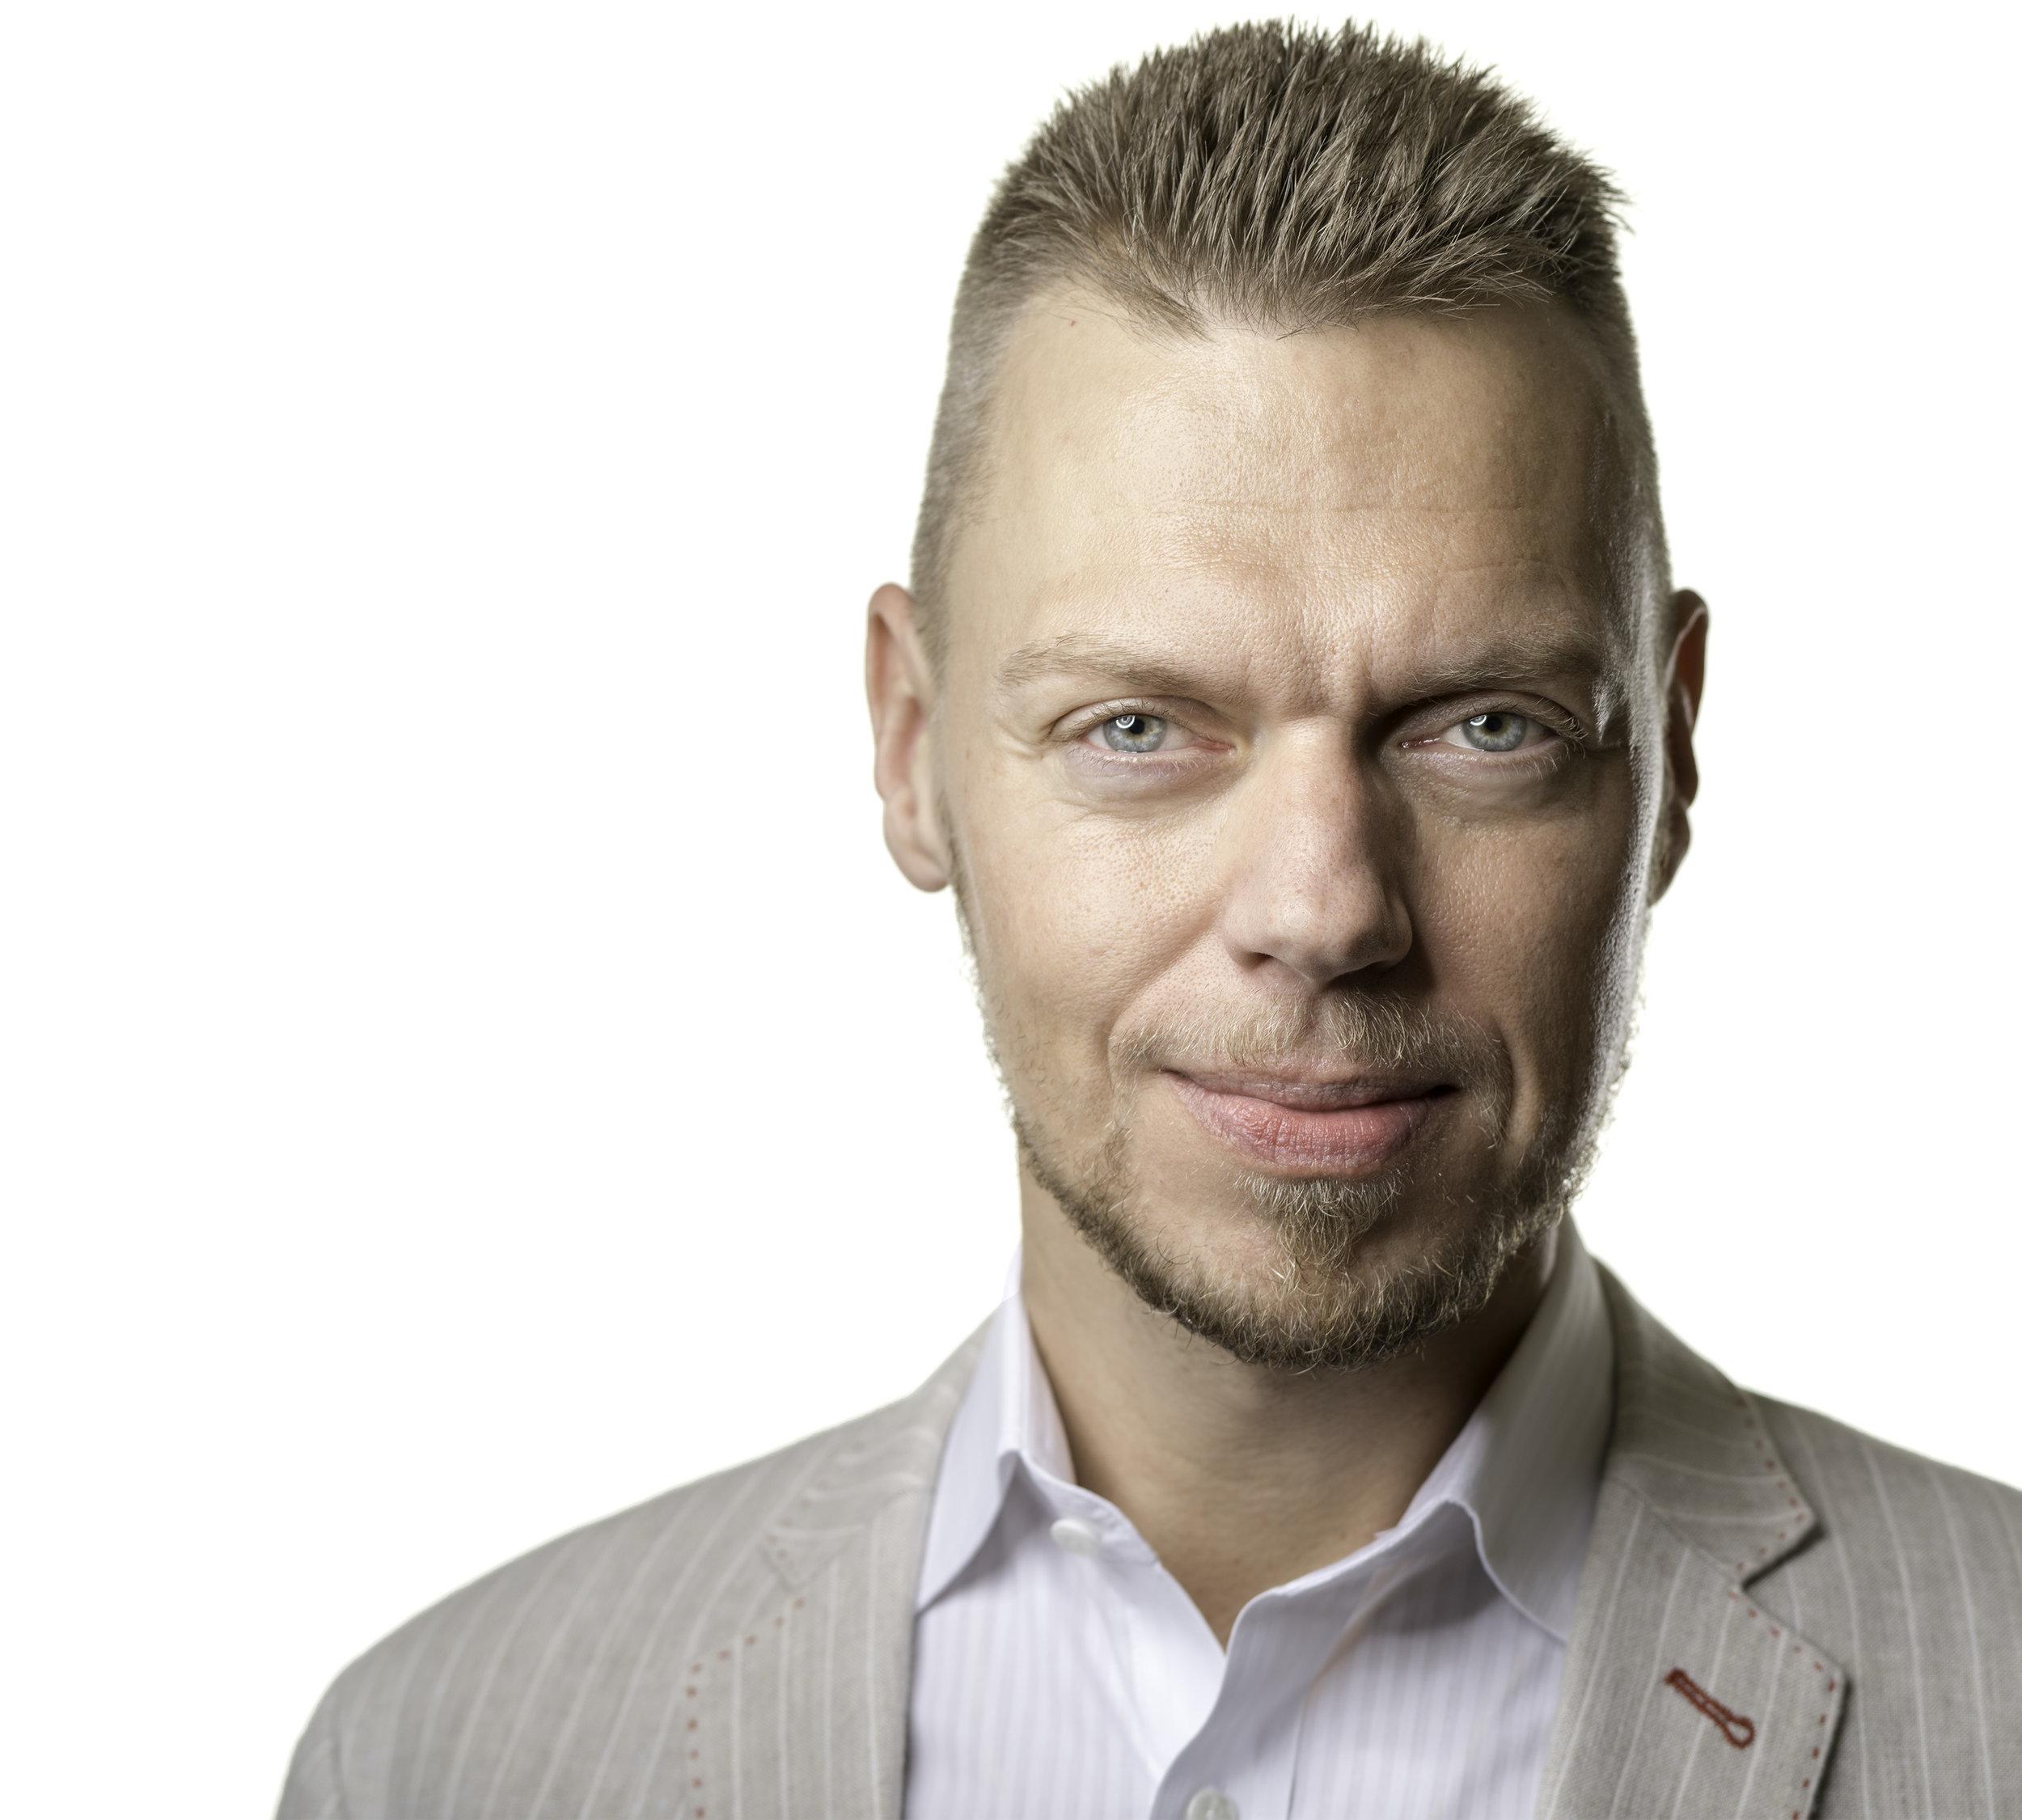 Frederik Bisbjerg; high resolution suitable for print -  download